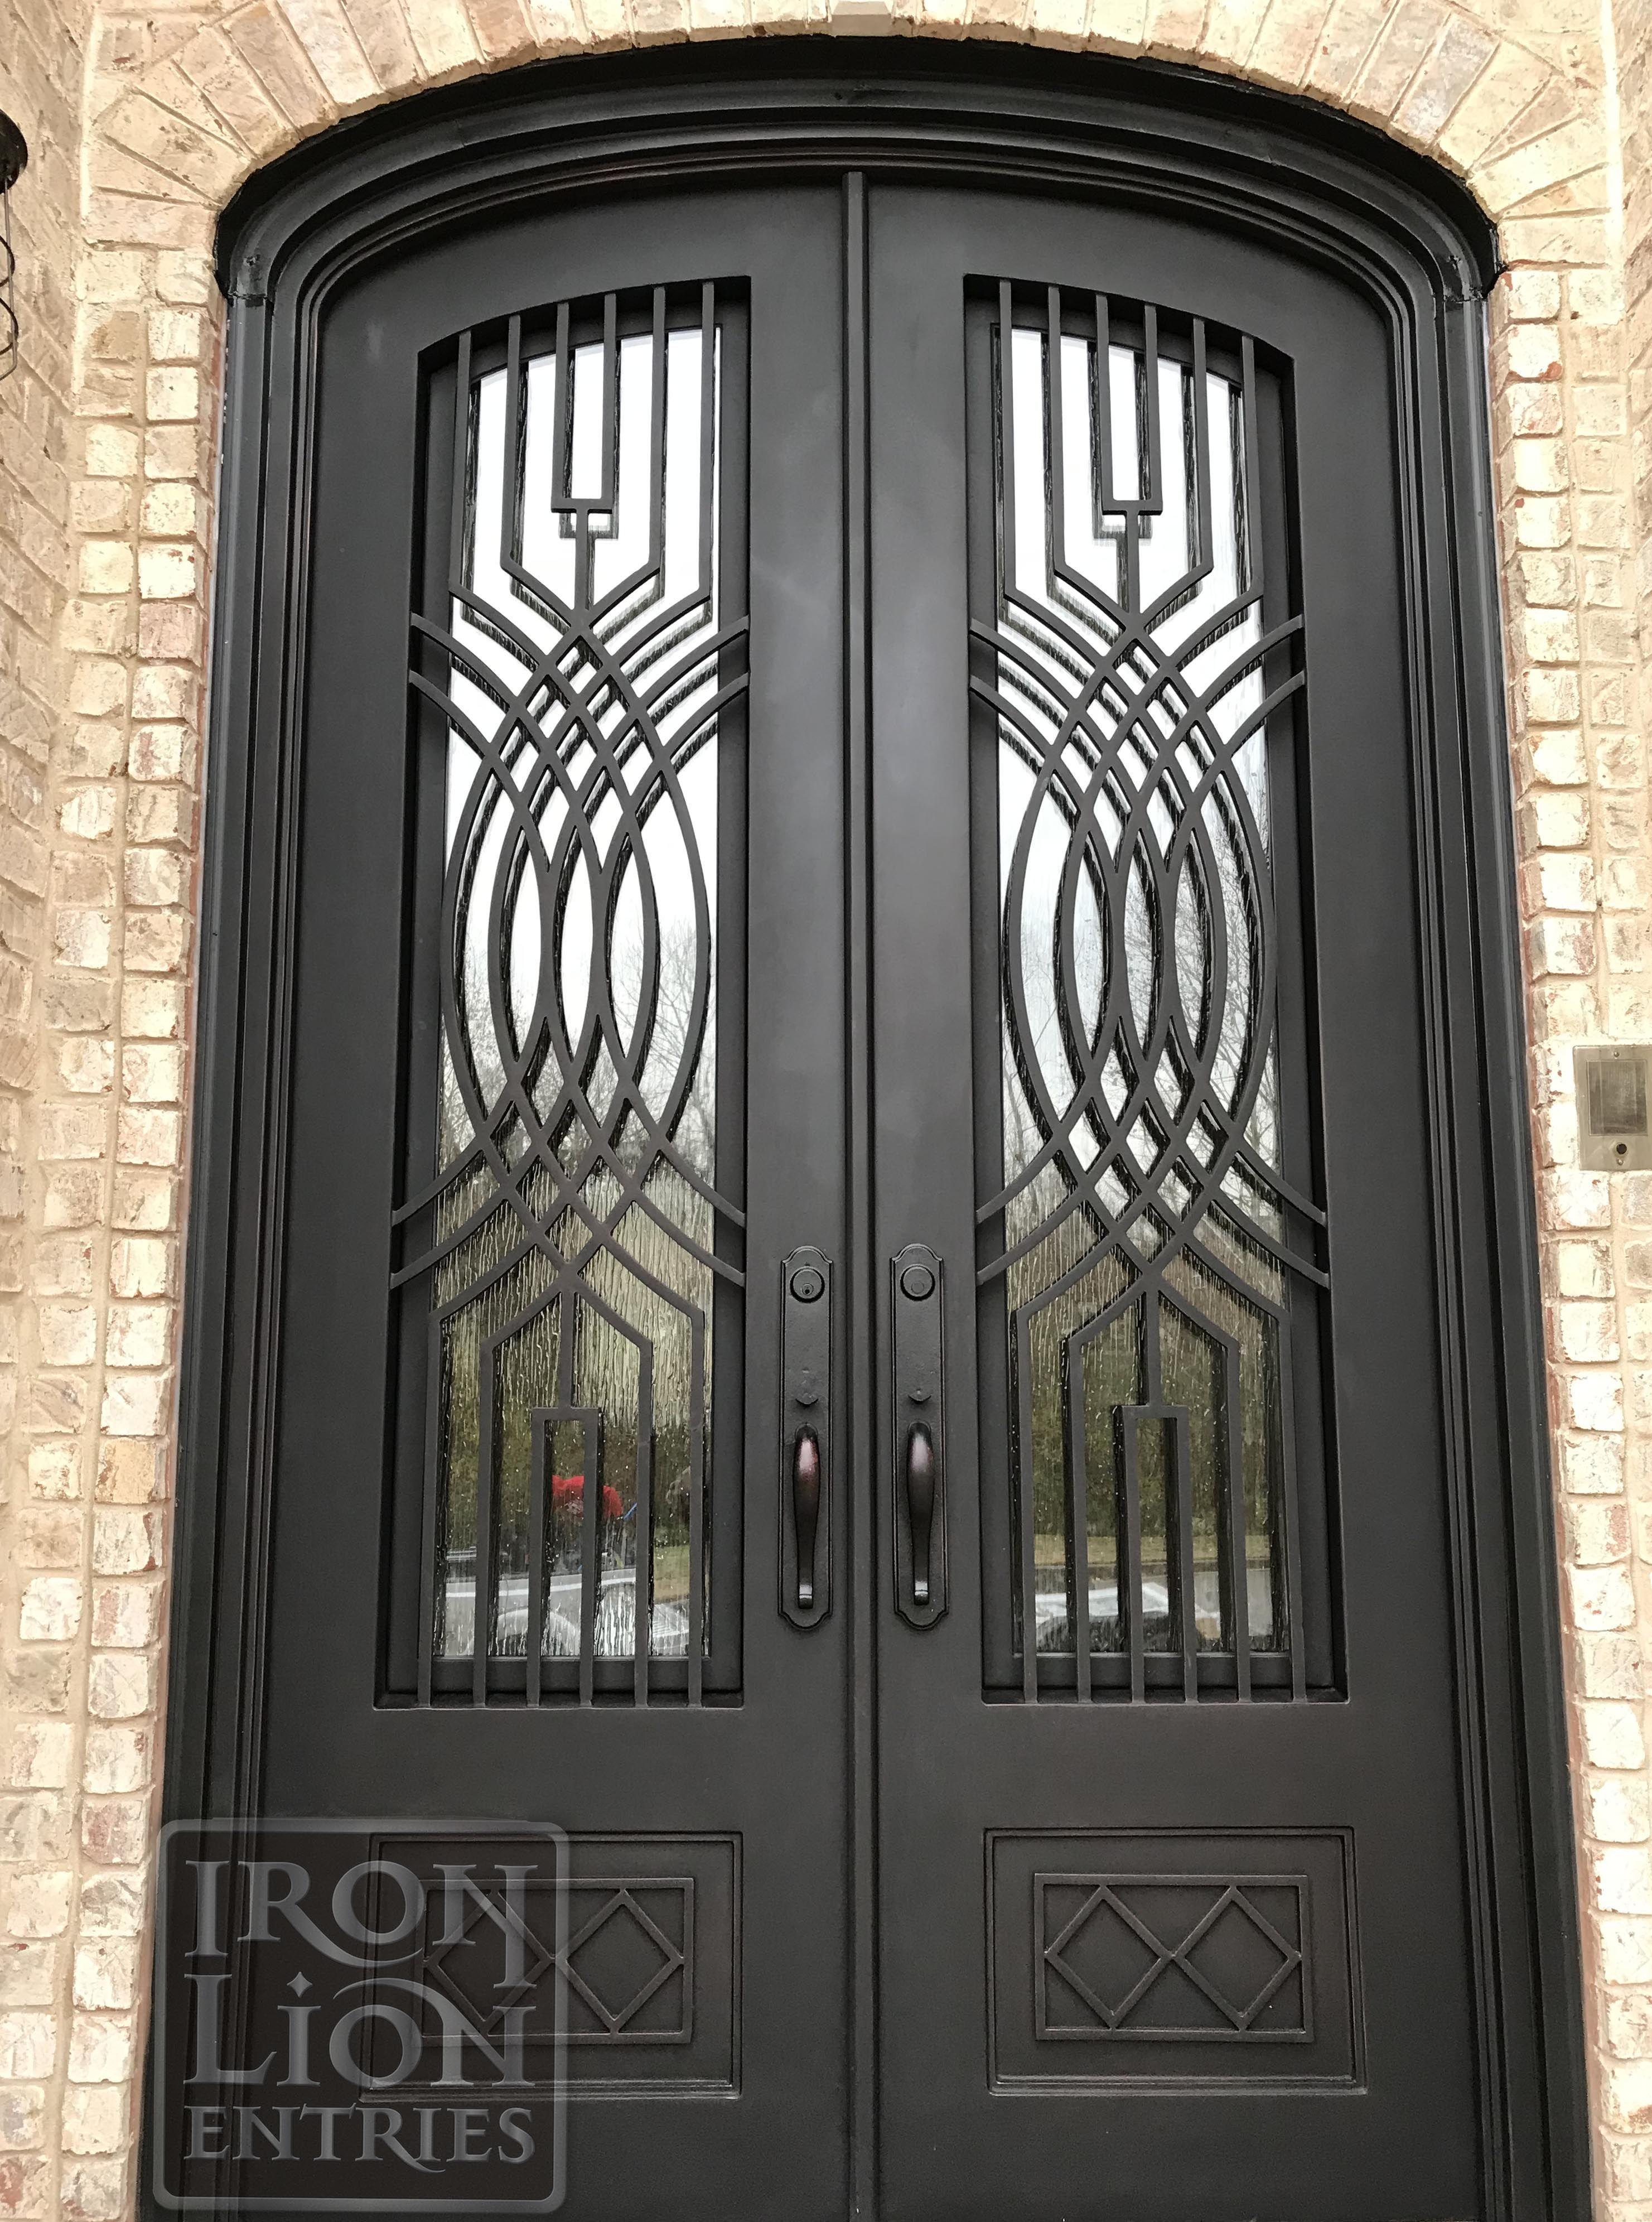 Double Doors Iron Lion Entries Iron Door Design Iron Front